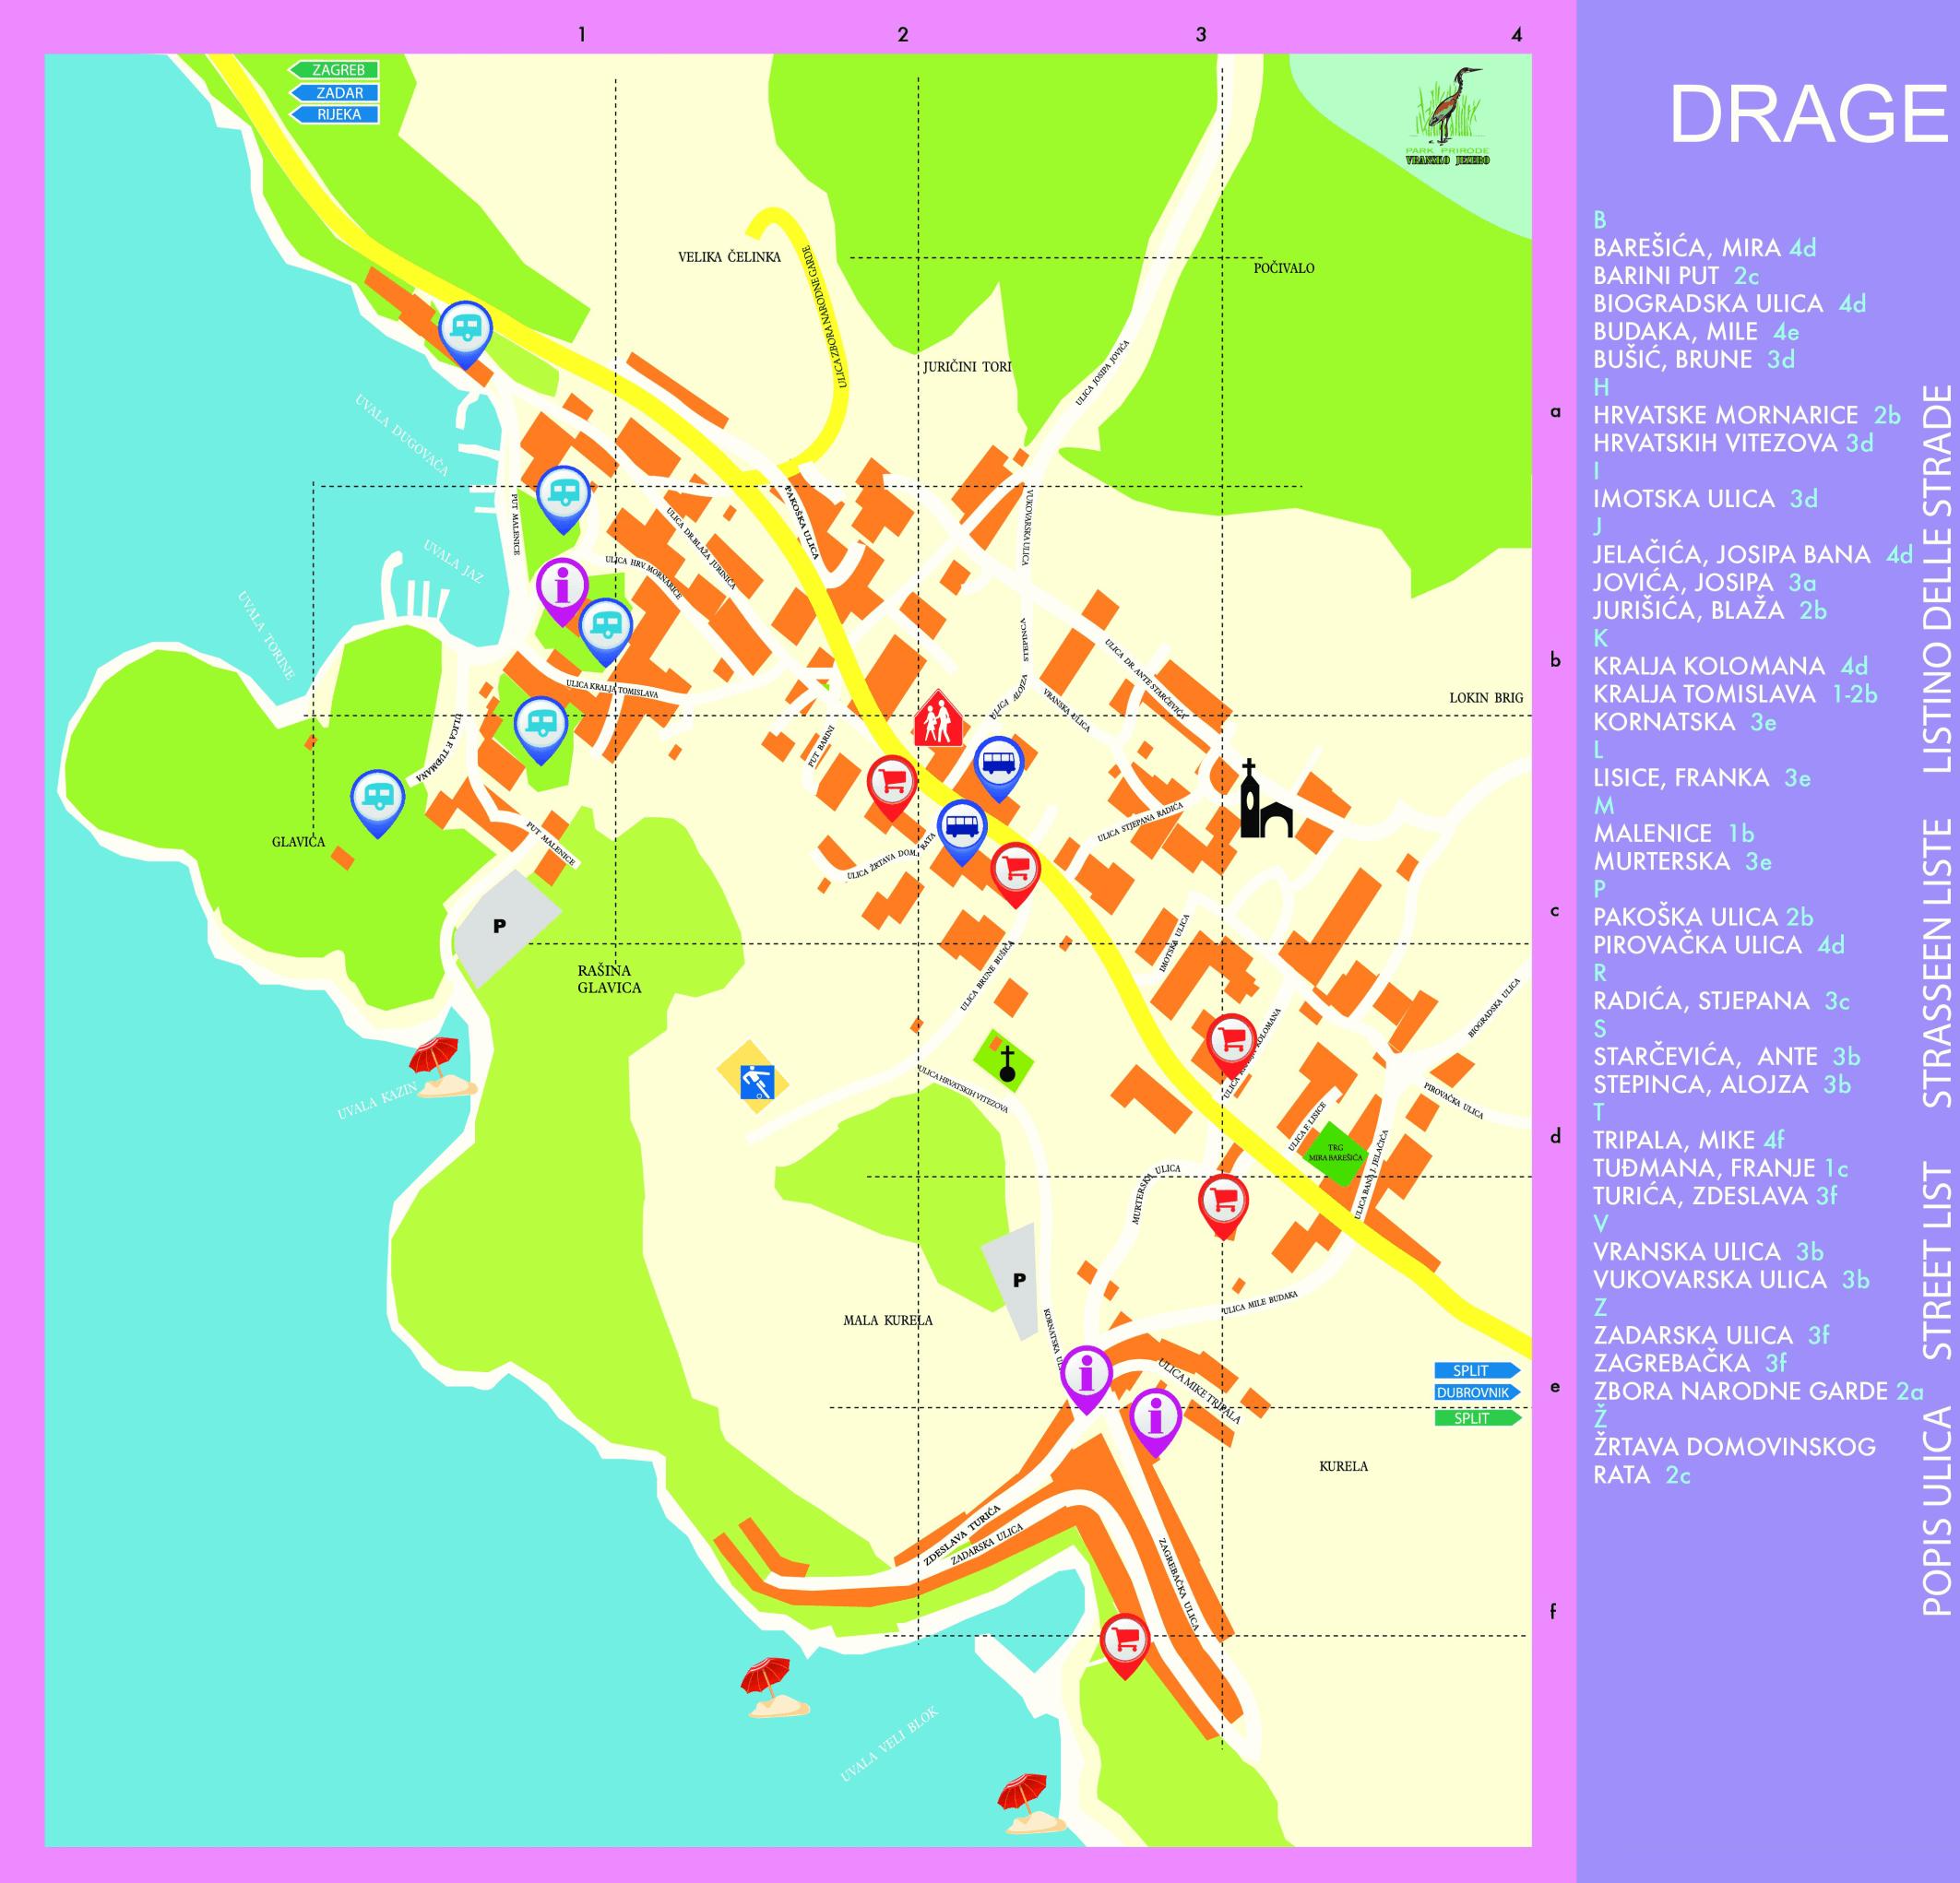 Plan mjesta Drage